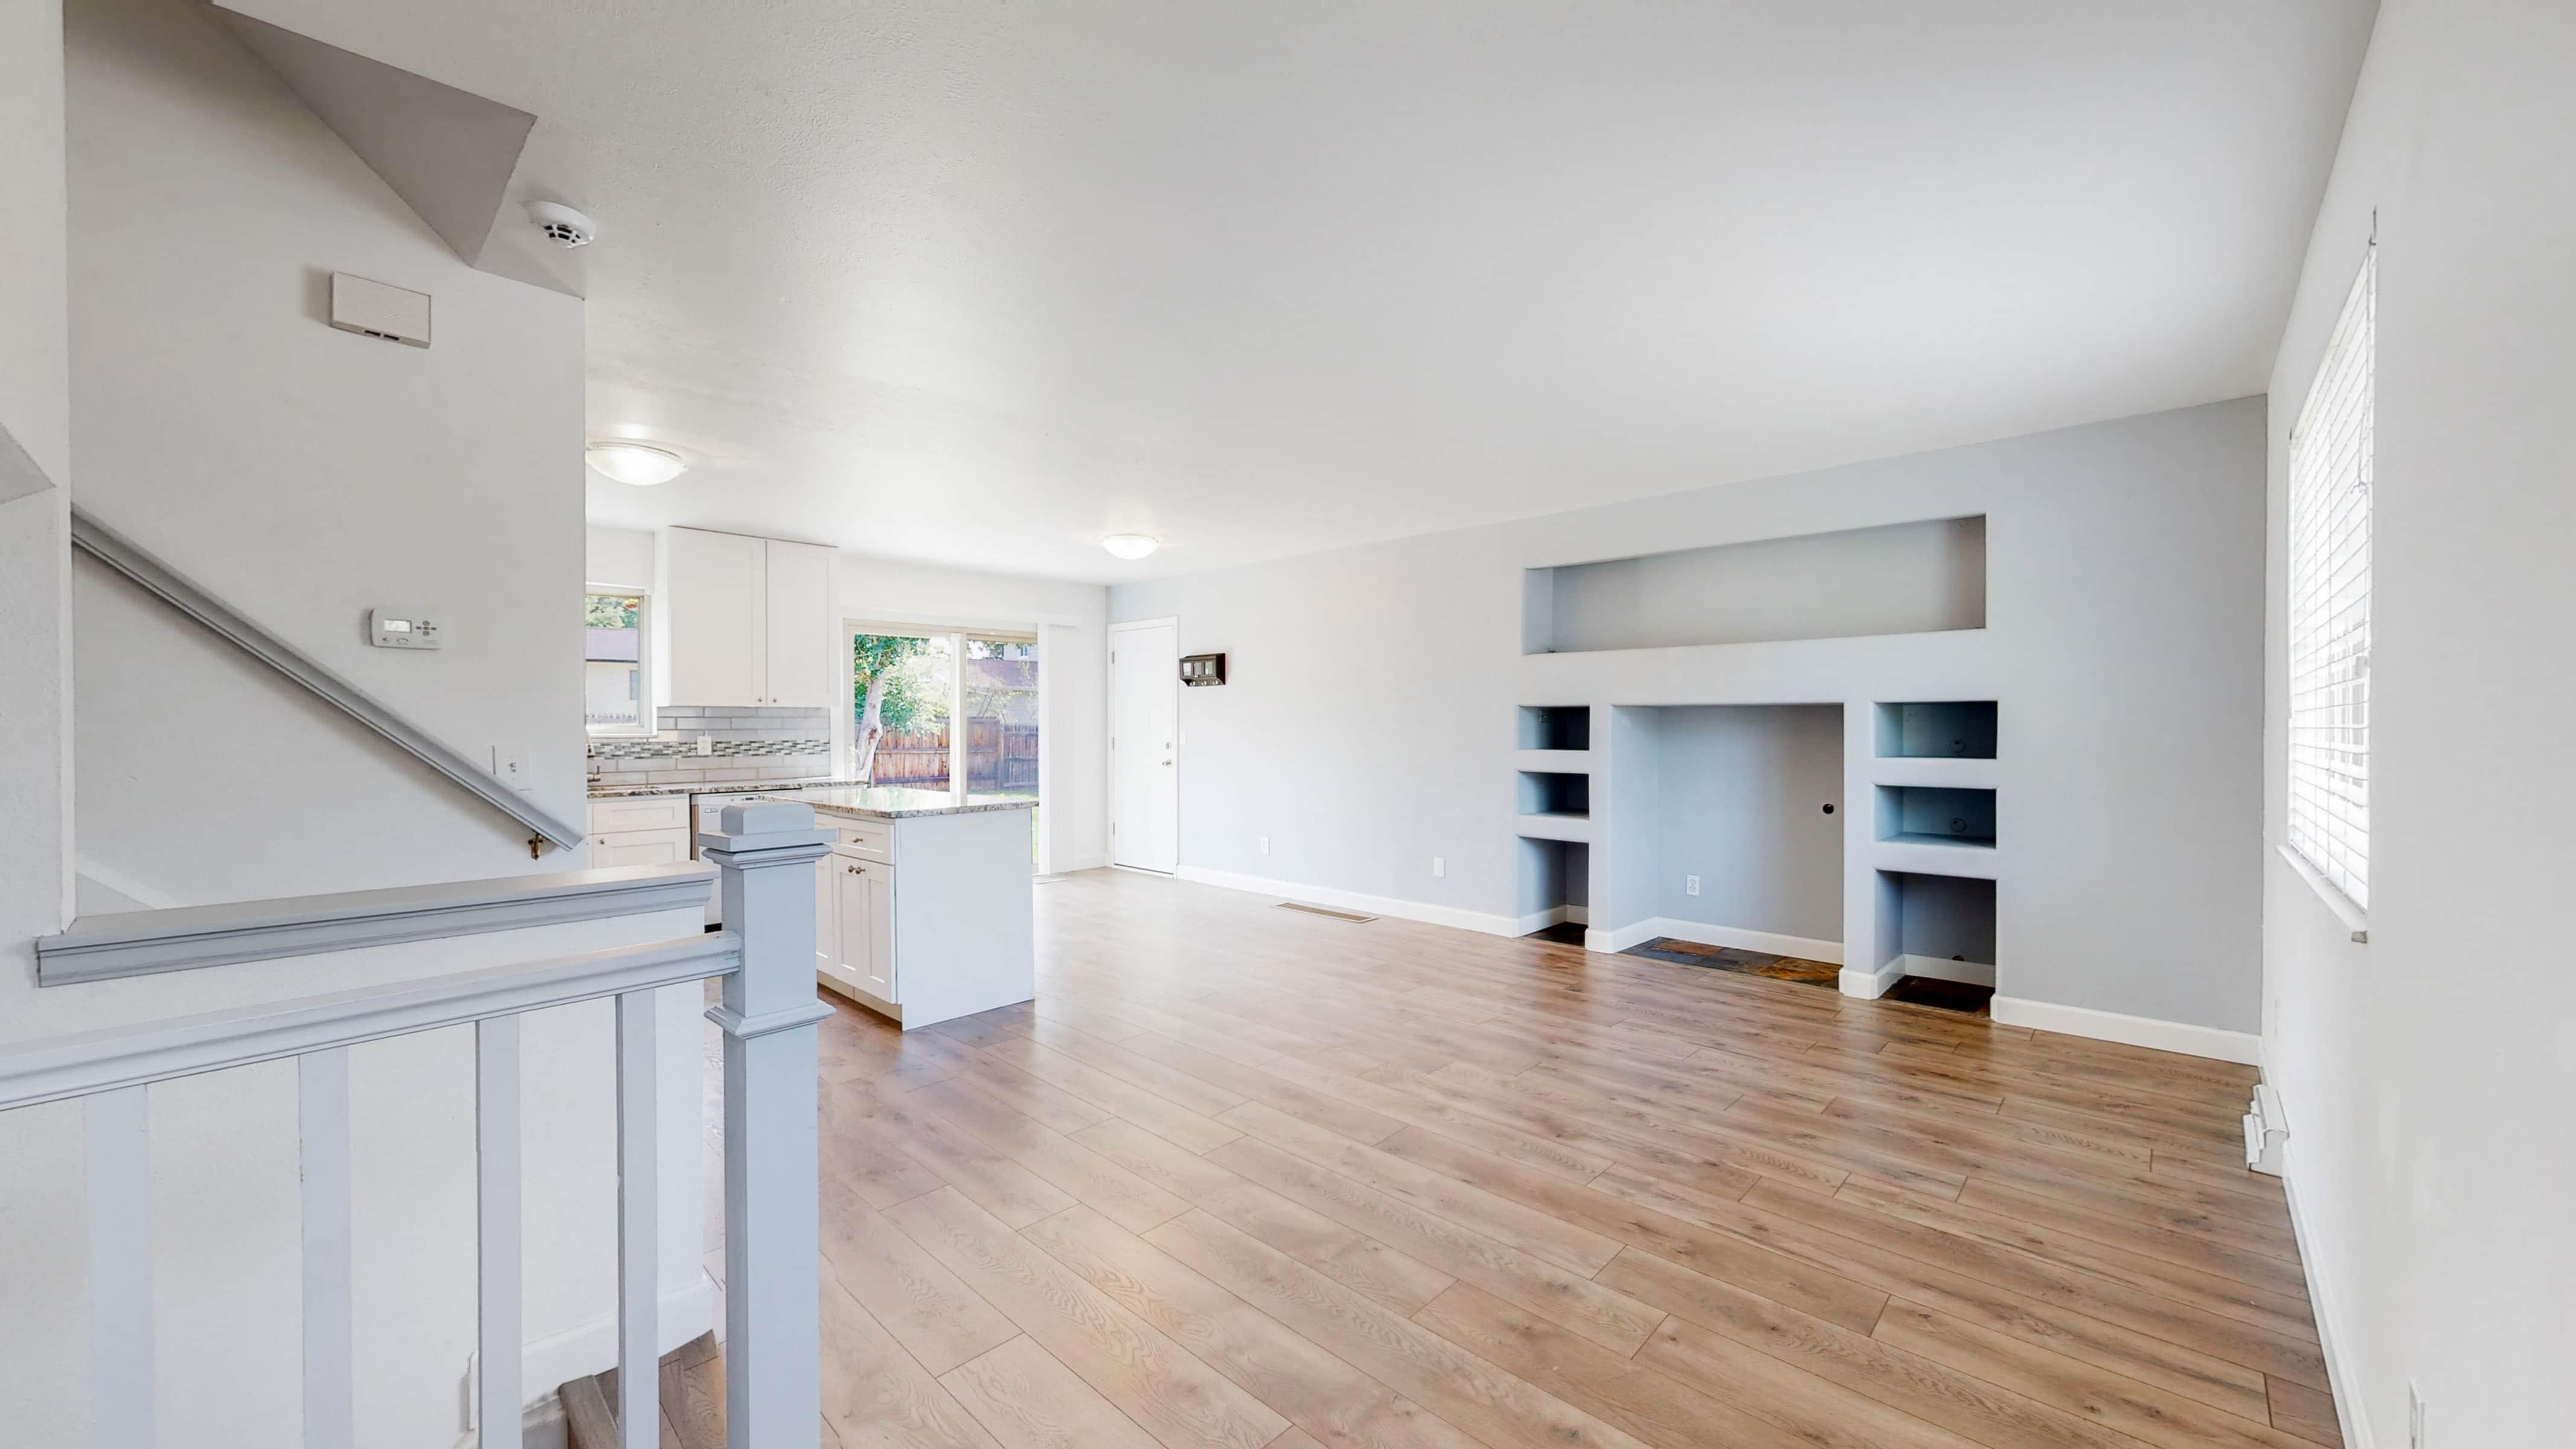 New pergo flooring open concept kitchen